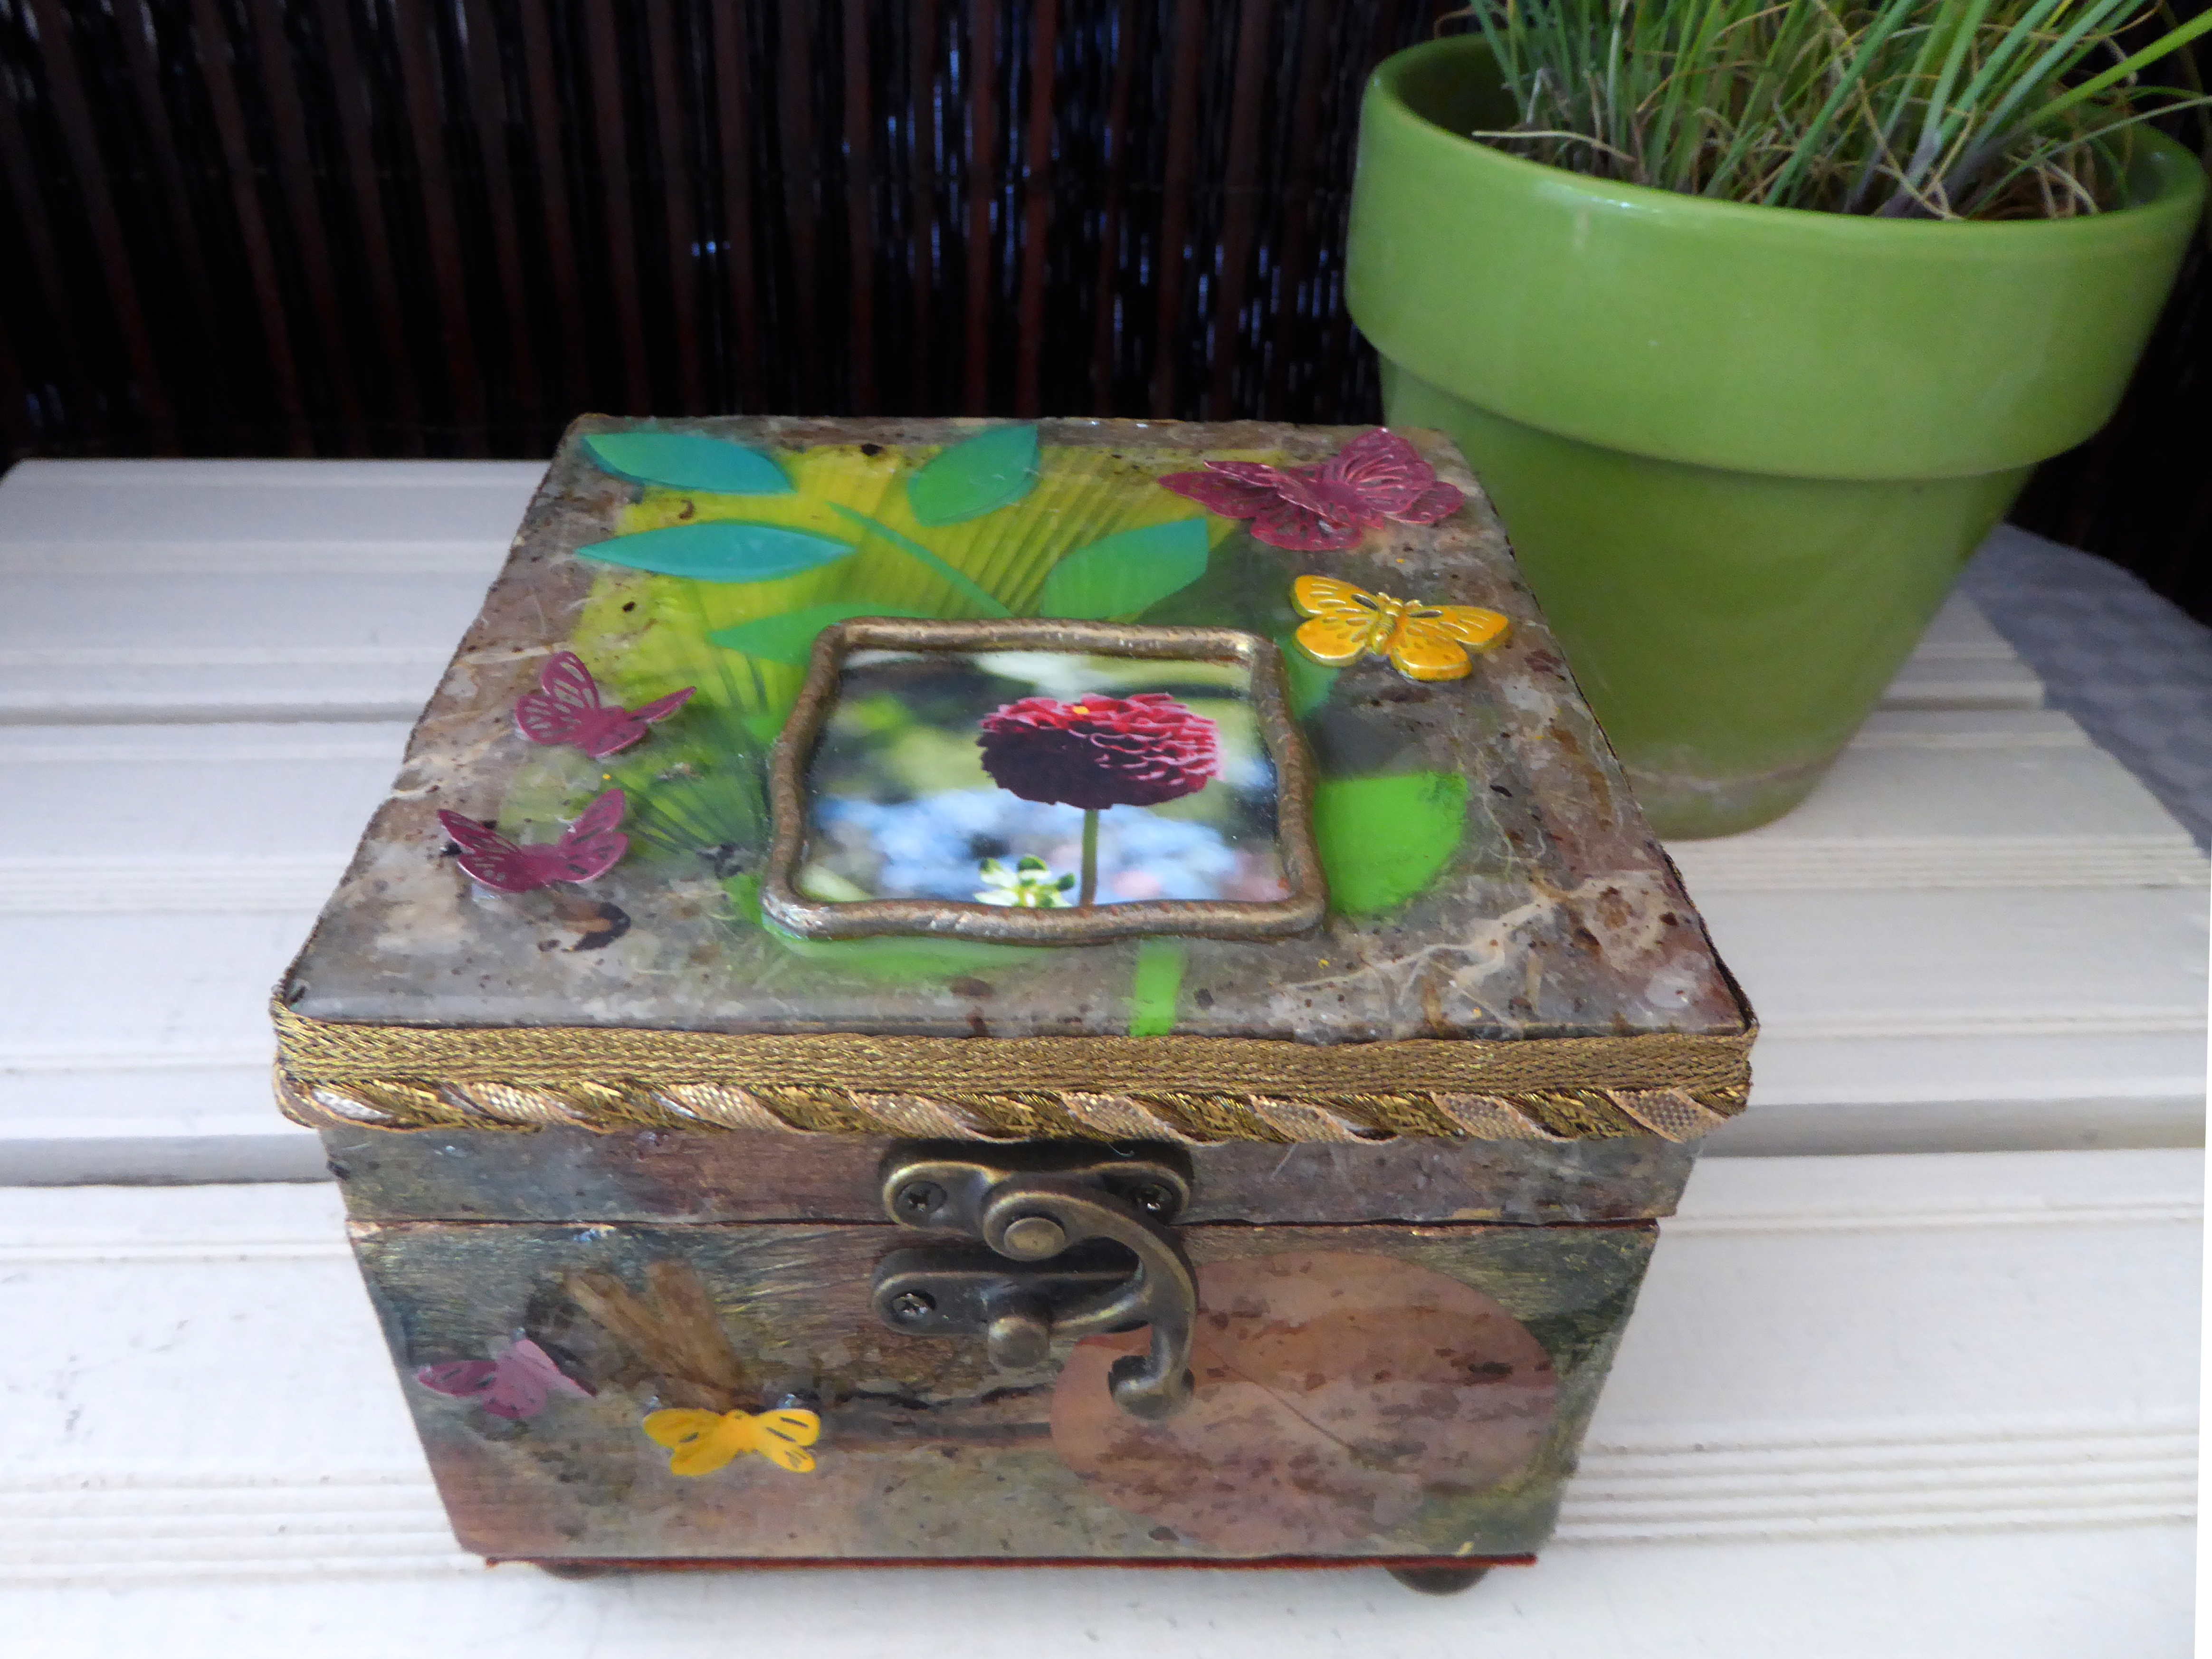 Botanical gardens decorative box